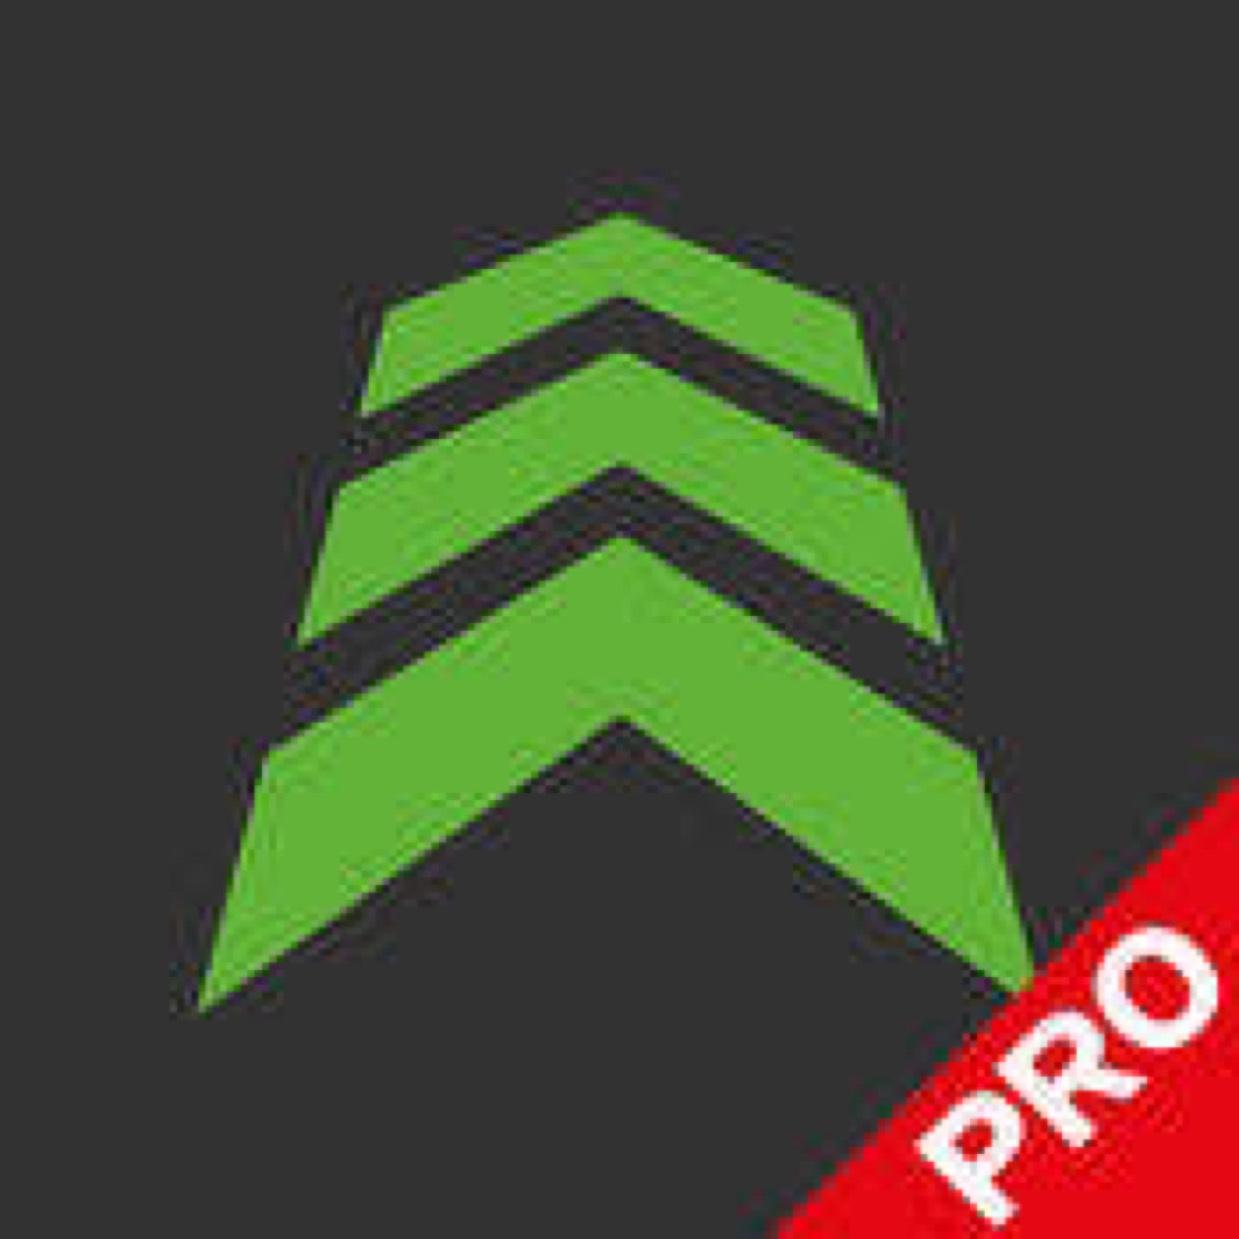 [iOS] Blitzer.de Pro auf 49cent reduziert